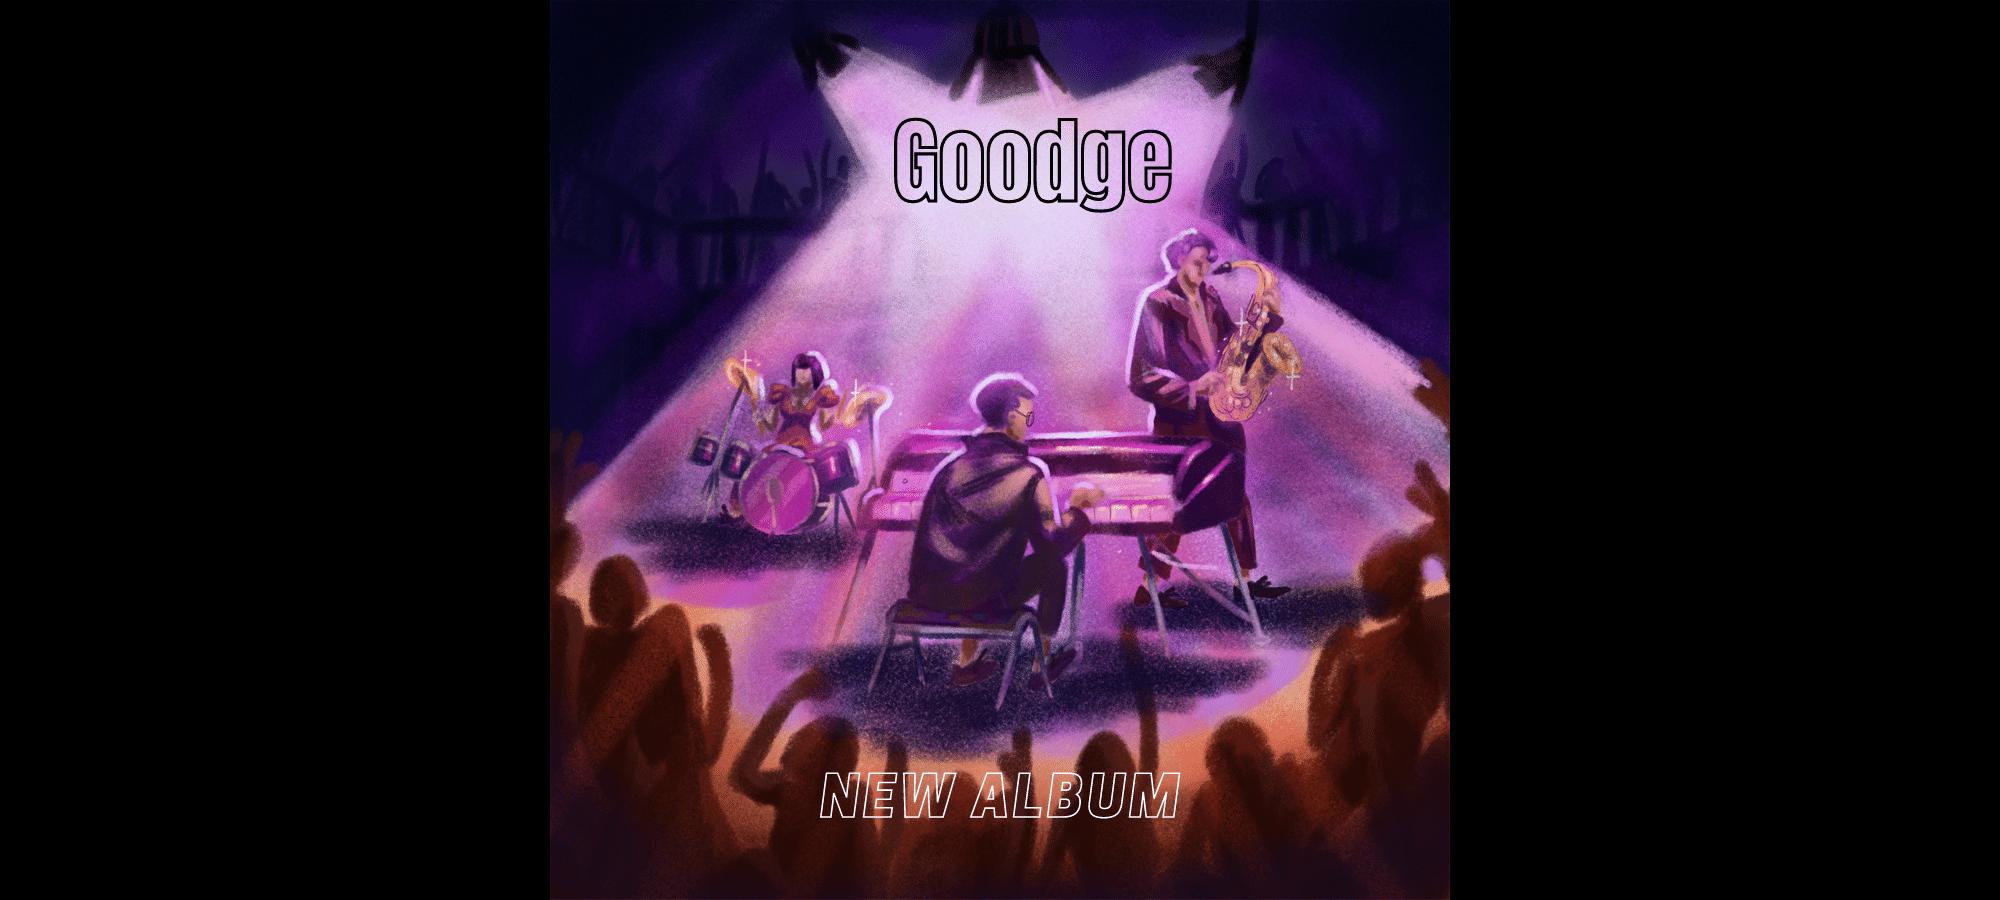 Goodge shares new album Journeys of Jazz - chill lofi hip hop soulful